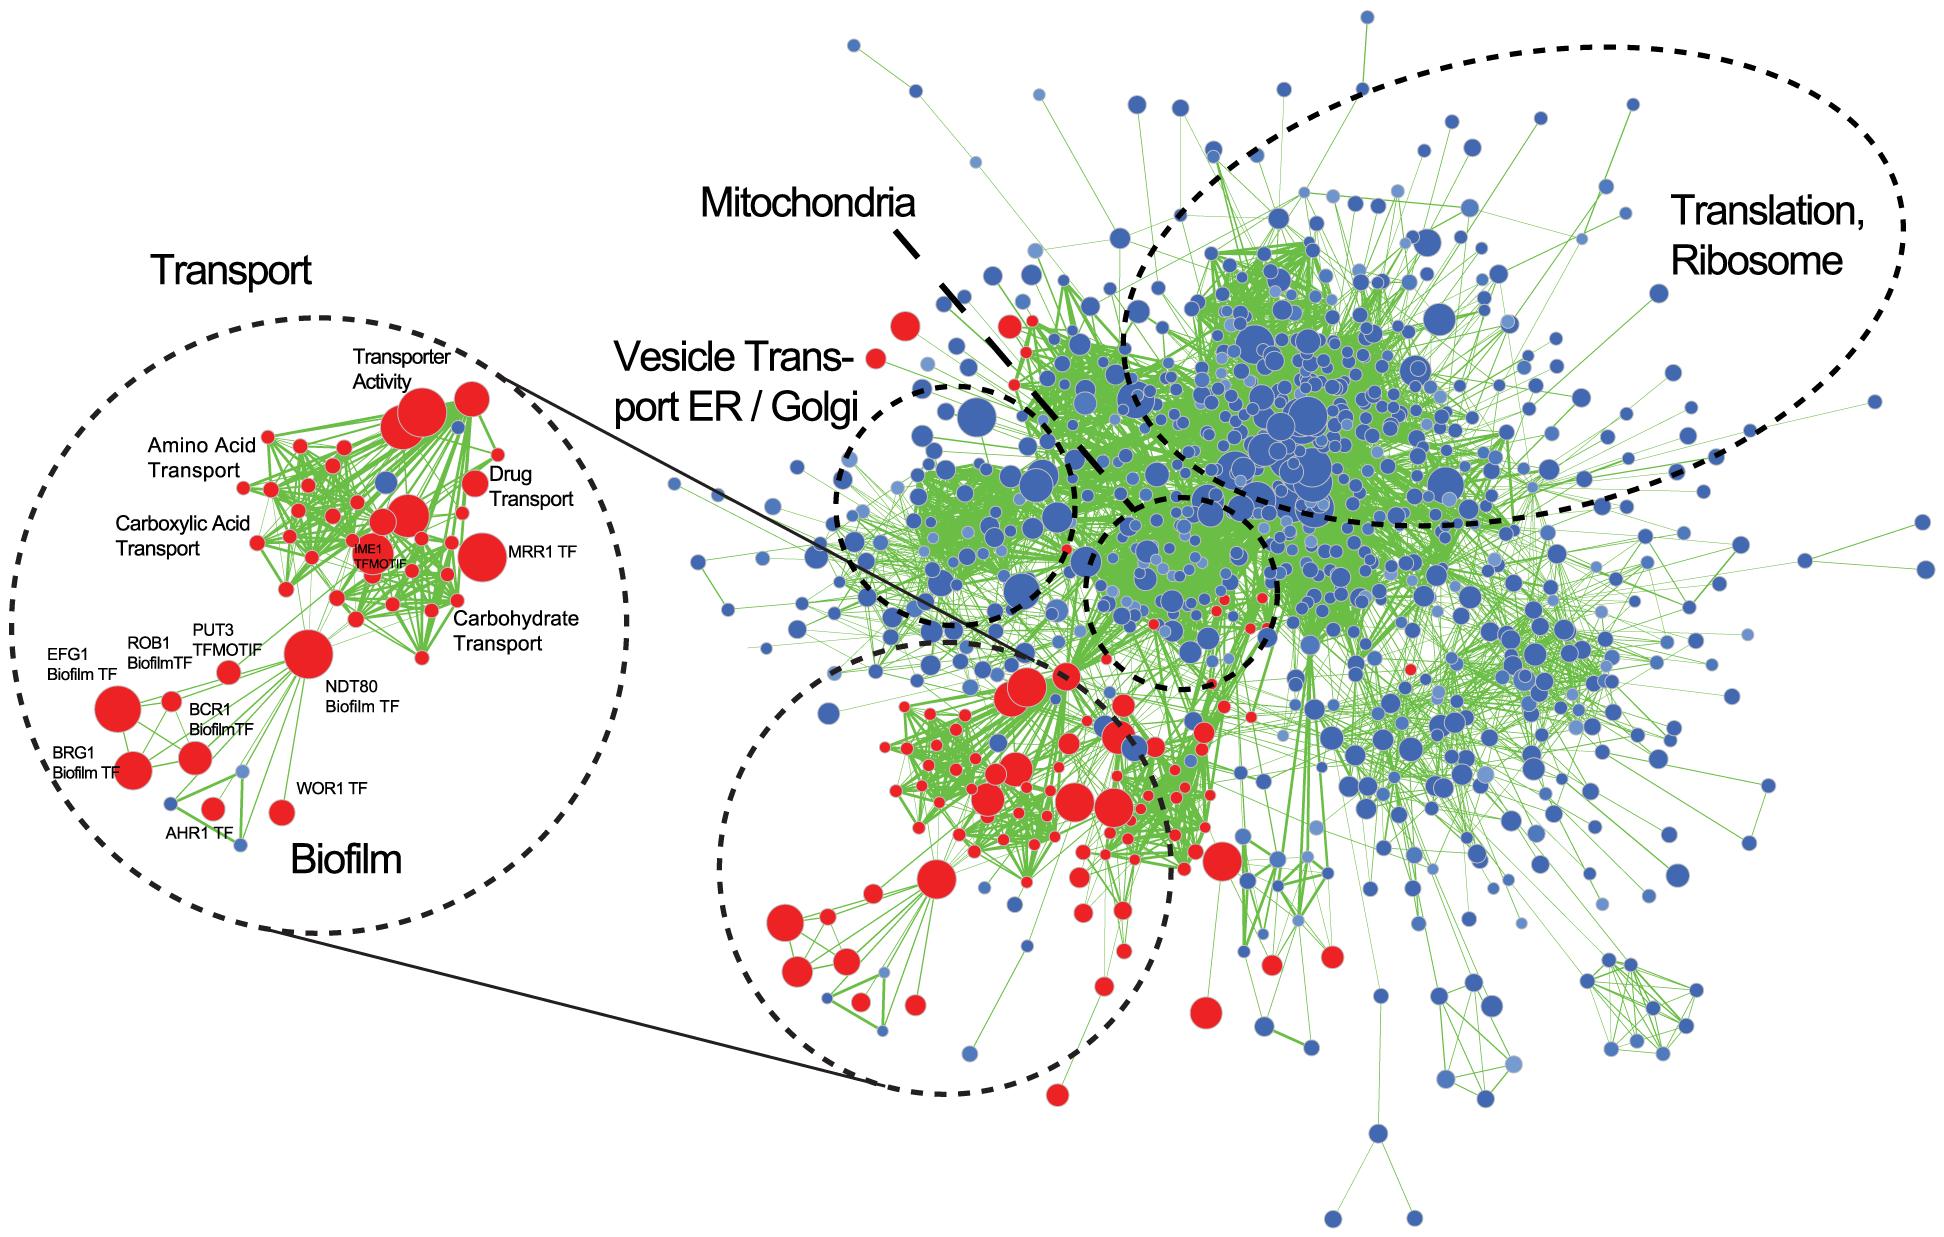 Gene Set Enrichment Analysis of the <i>C. parapsilosis</i> biofilm transcriptome.